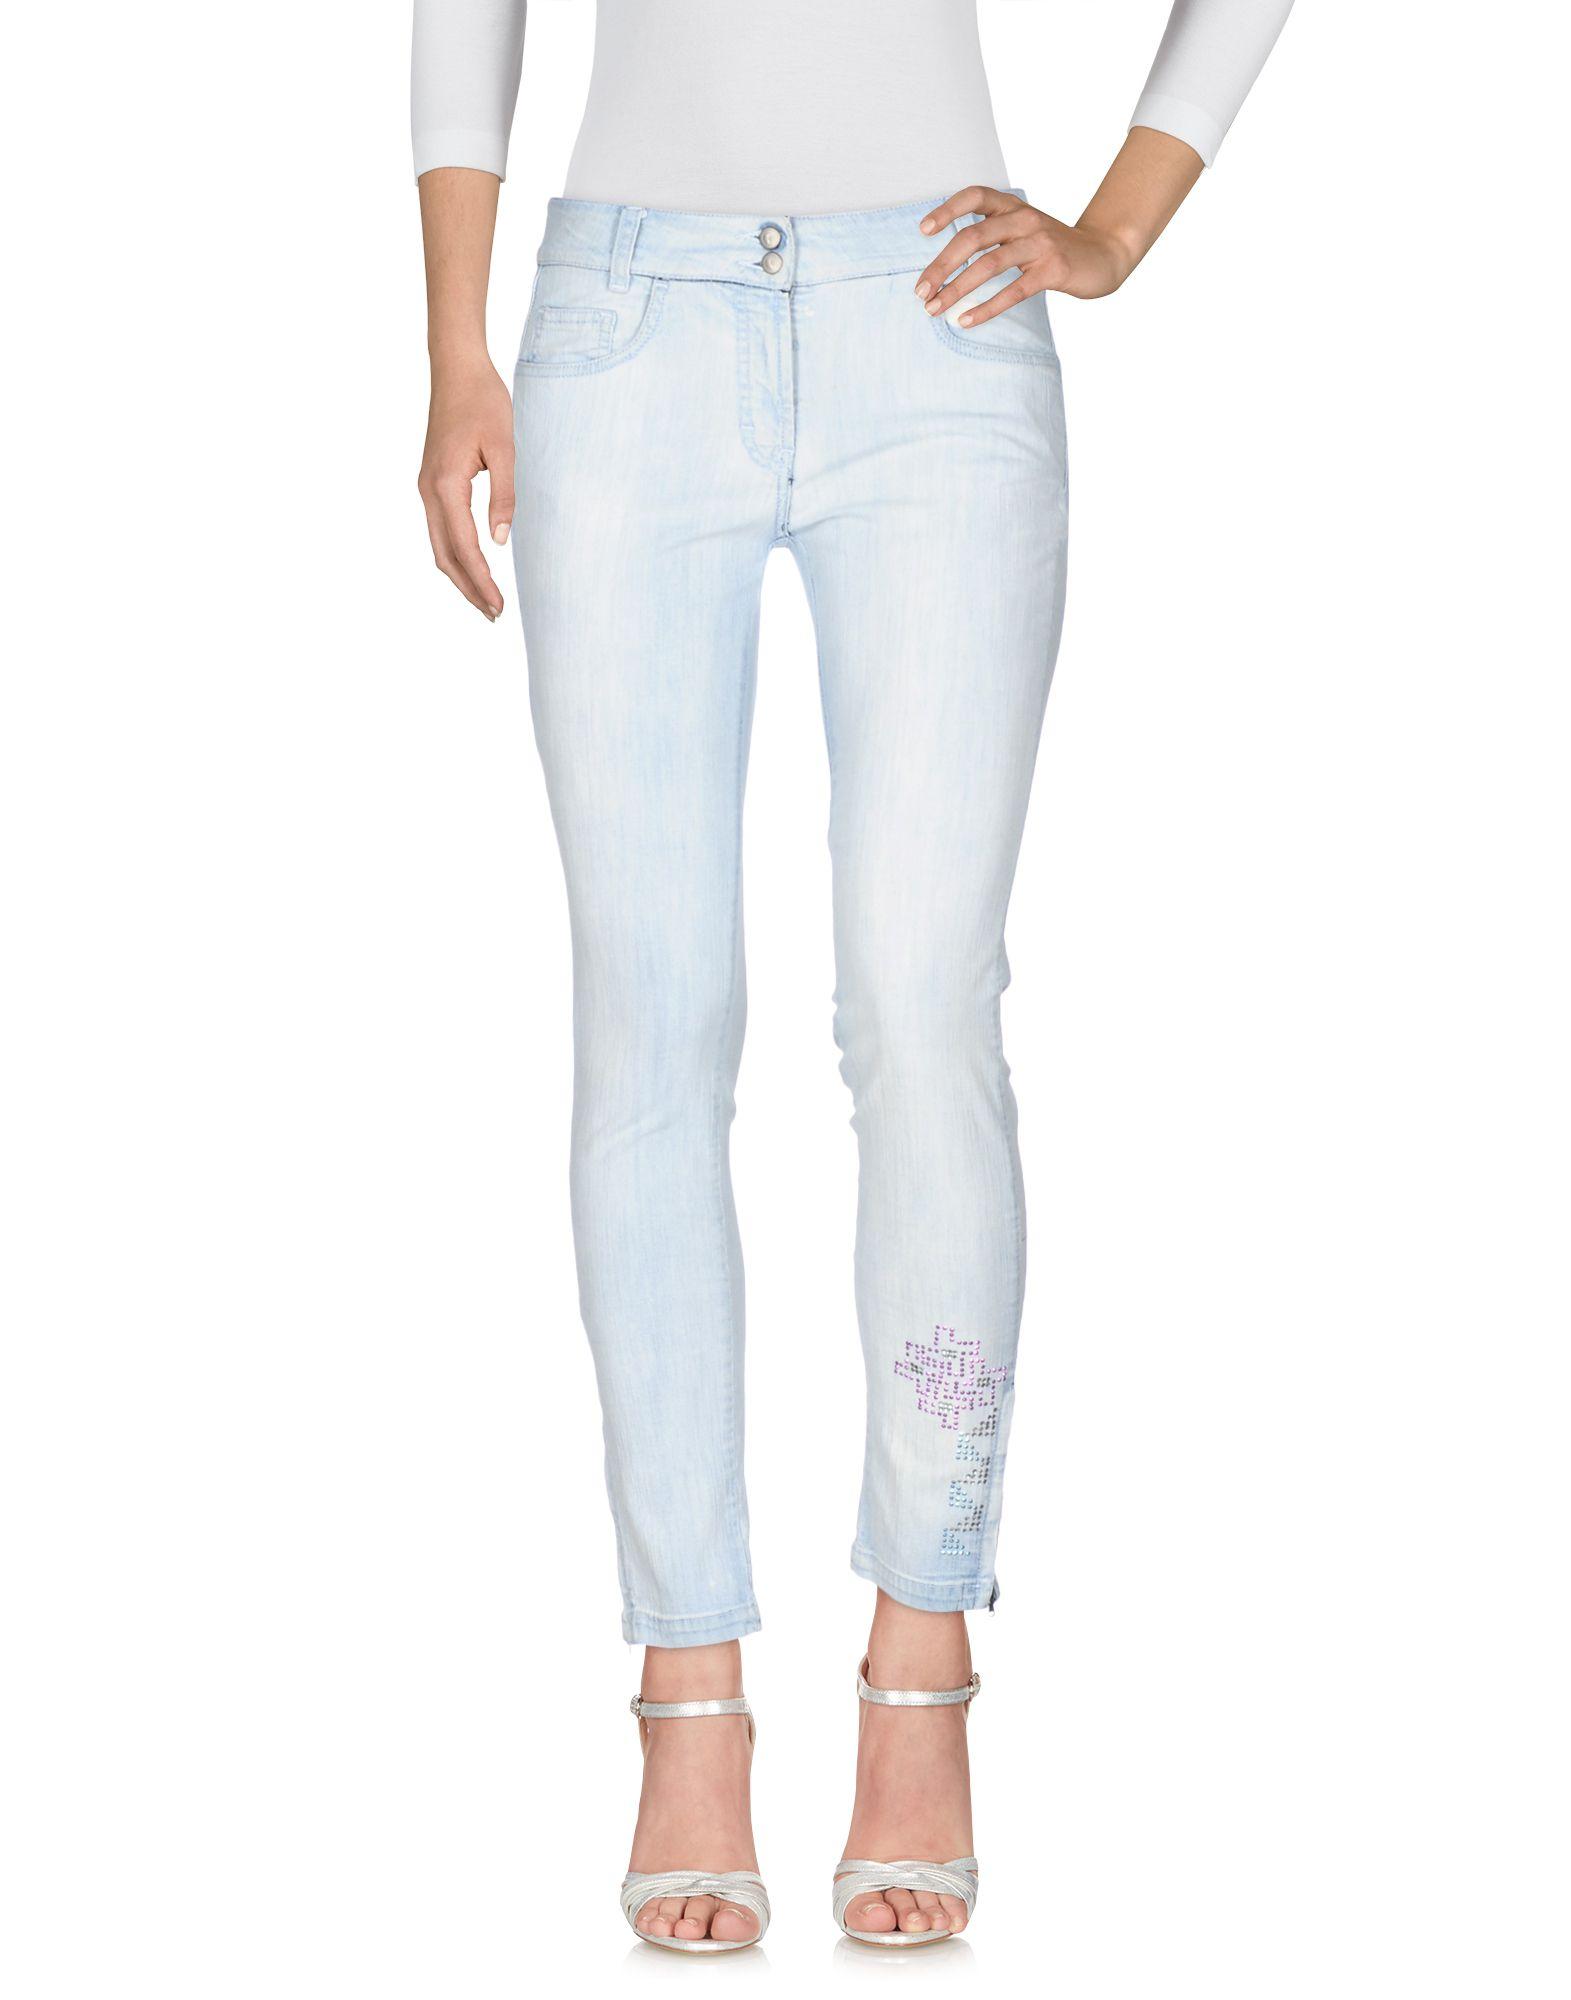 Pantaloni Jeans Trussardi Jeans Donna - Acquista online su zxsuaPYI